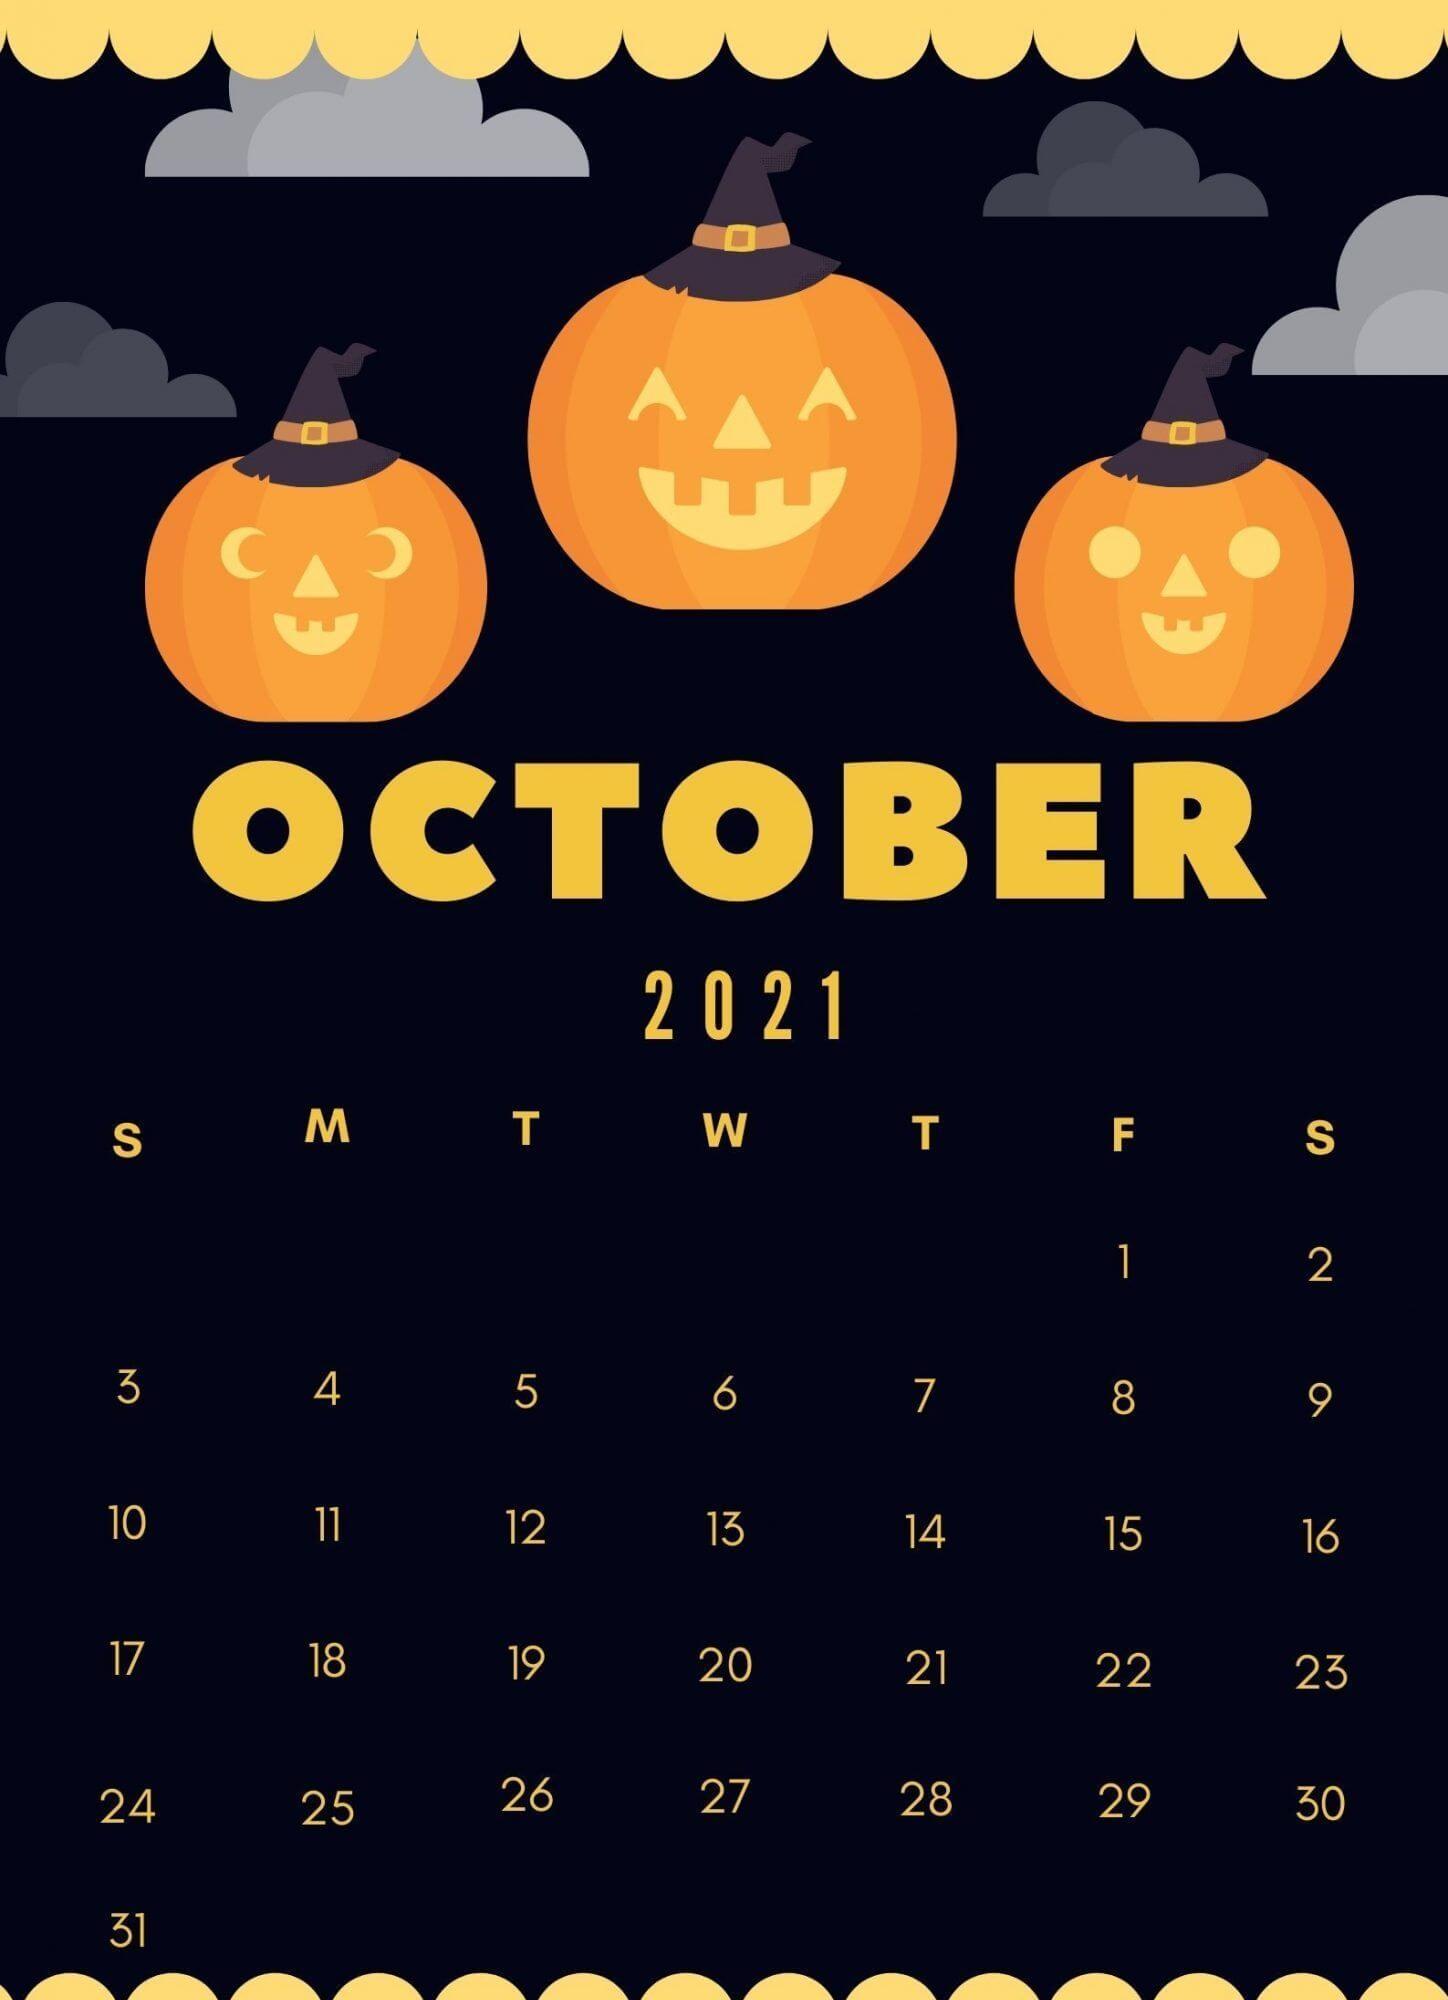 October 2021 iPhone Calendar Wallpaper